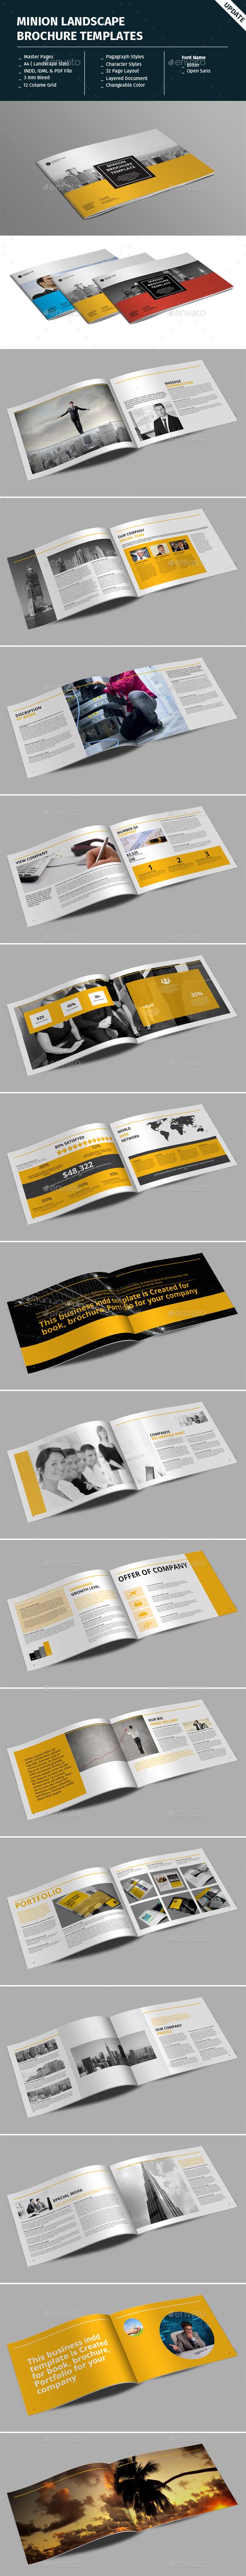 Minion Landscape Brochure Templates - Corporate Brochures